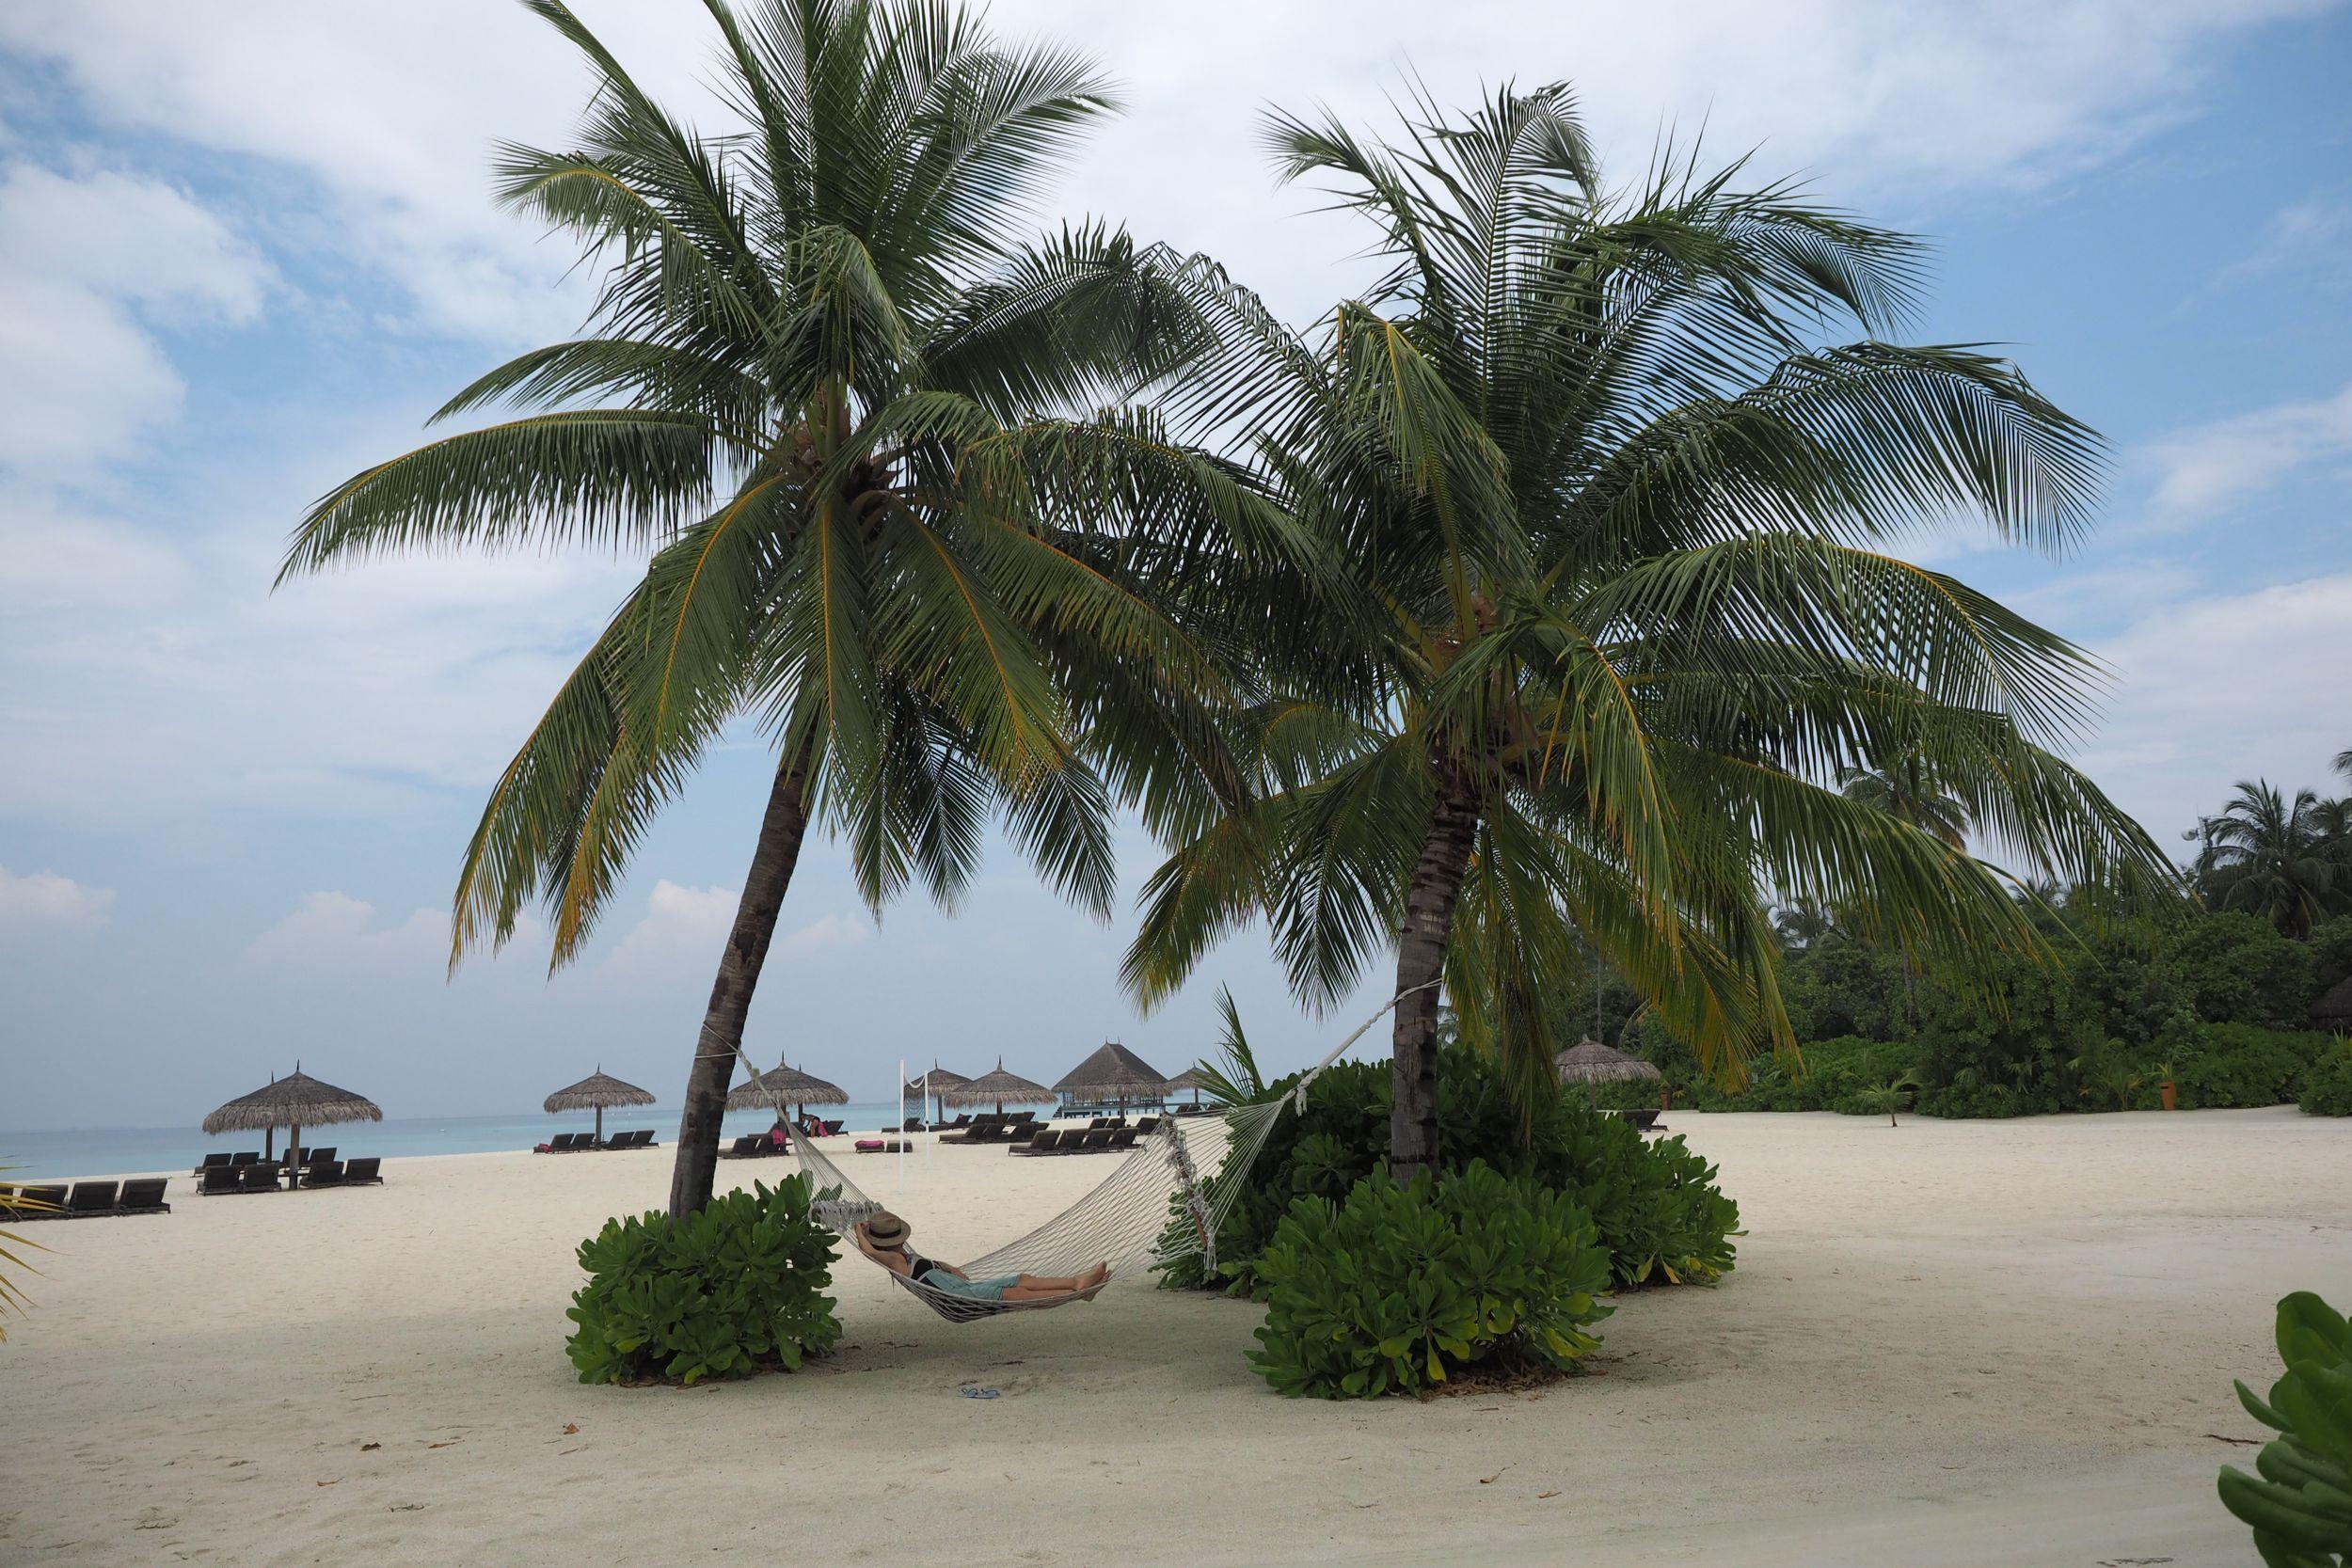 maldives, constance hotels, maldiv, constance, billur saatci, off nereye gitsem, offnegiysem, turkish blogger, heaven, vacation, moofushi, halaveli